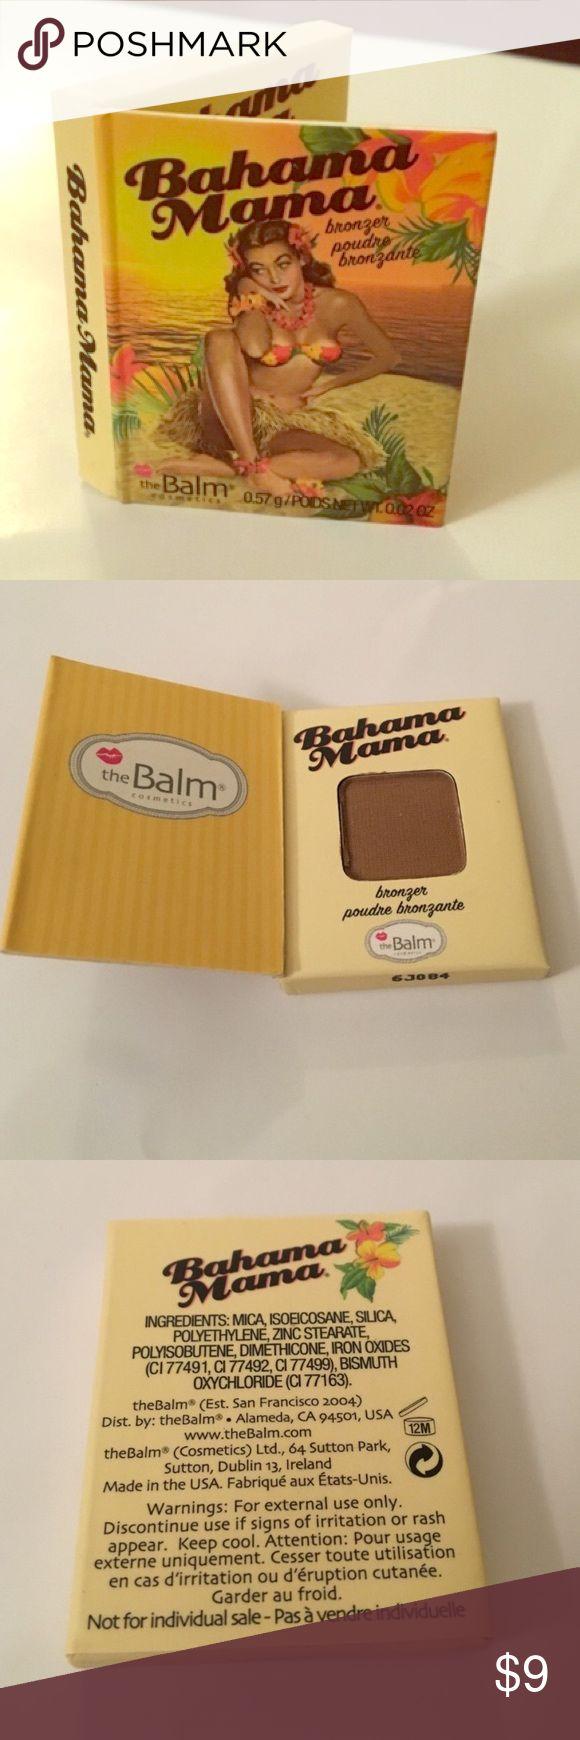 NEW The Balm Bahama Mama bronzer, 0.02oz NEW The Balm Bahama Mama bronzer, 0.02oz the Balm cosmetics Makeup Bronzer